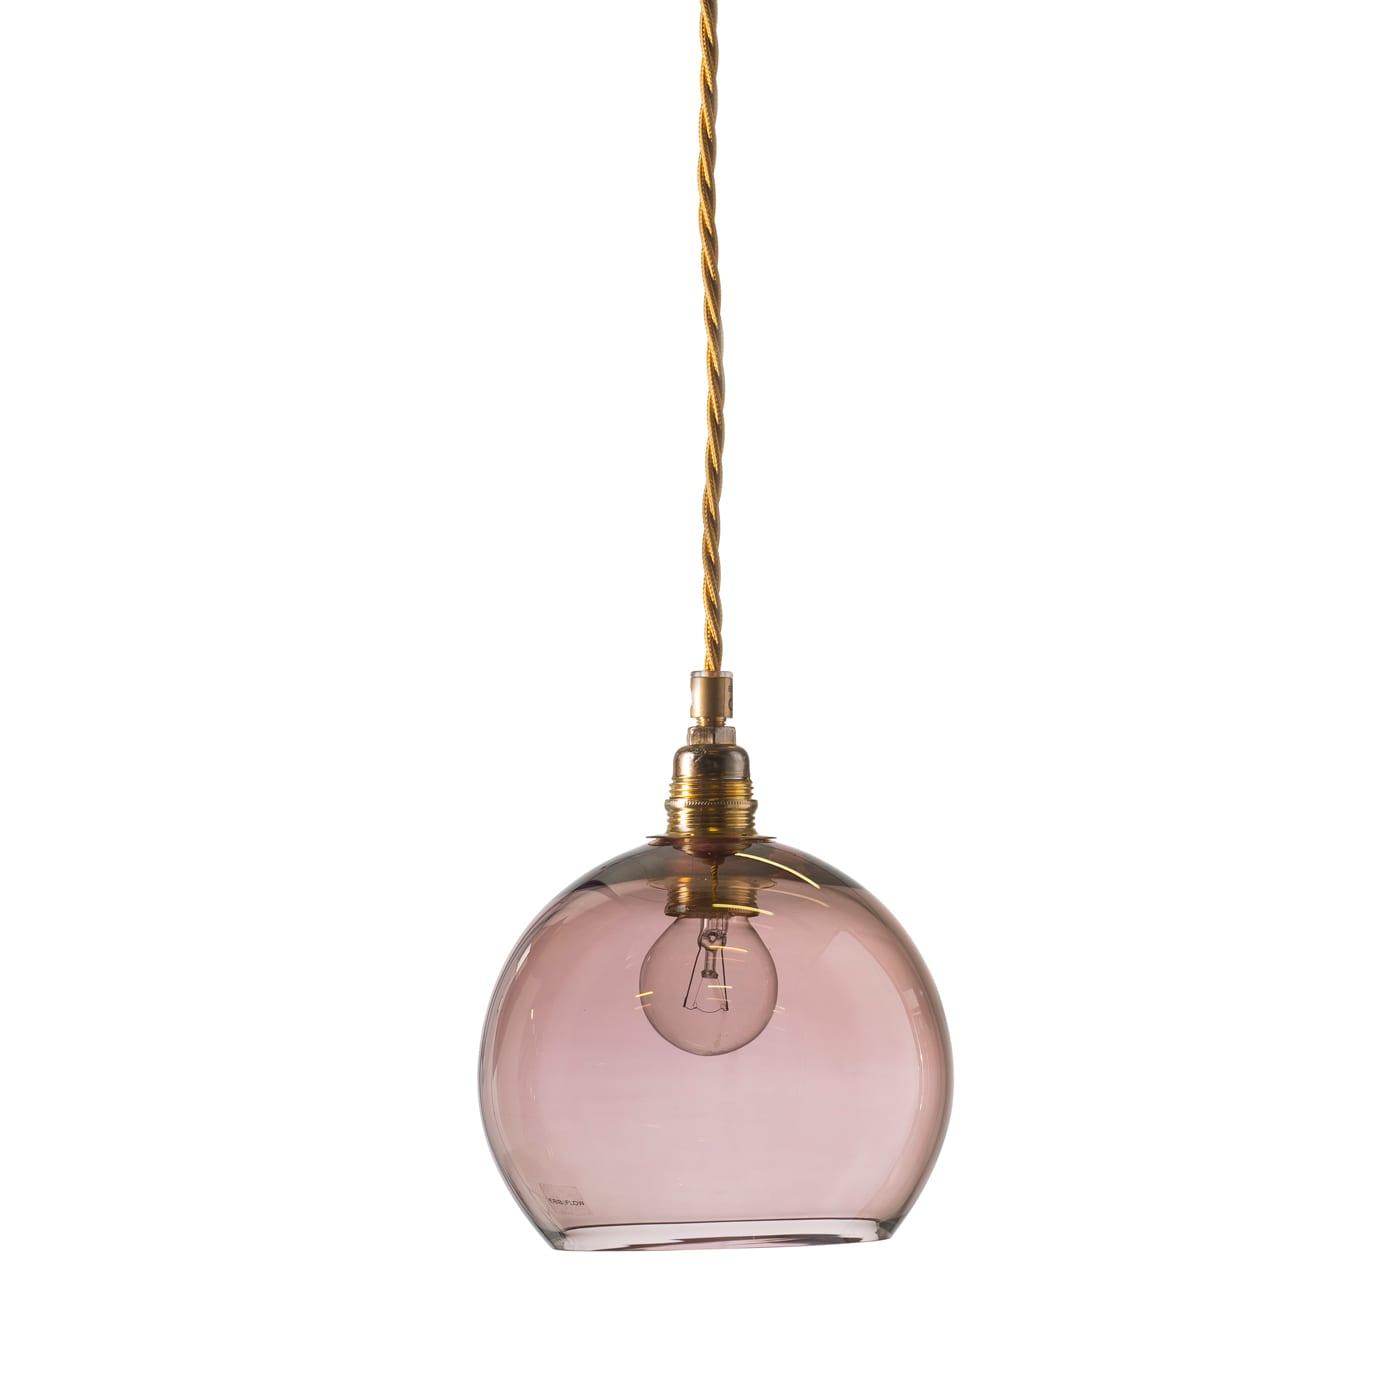 Rowan pendant lamp, obsidian, 15cm 1